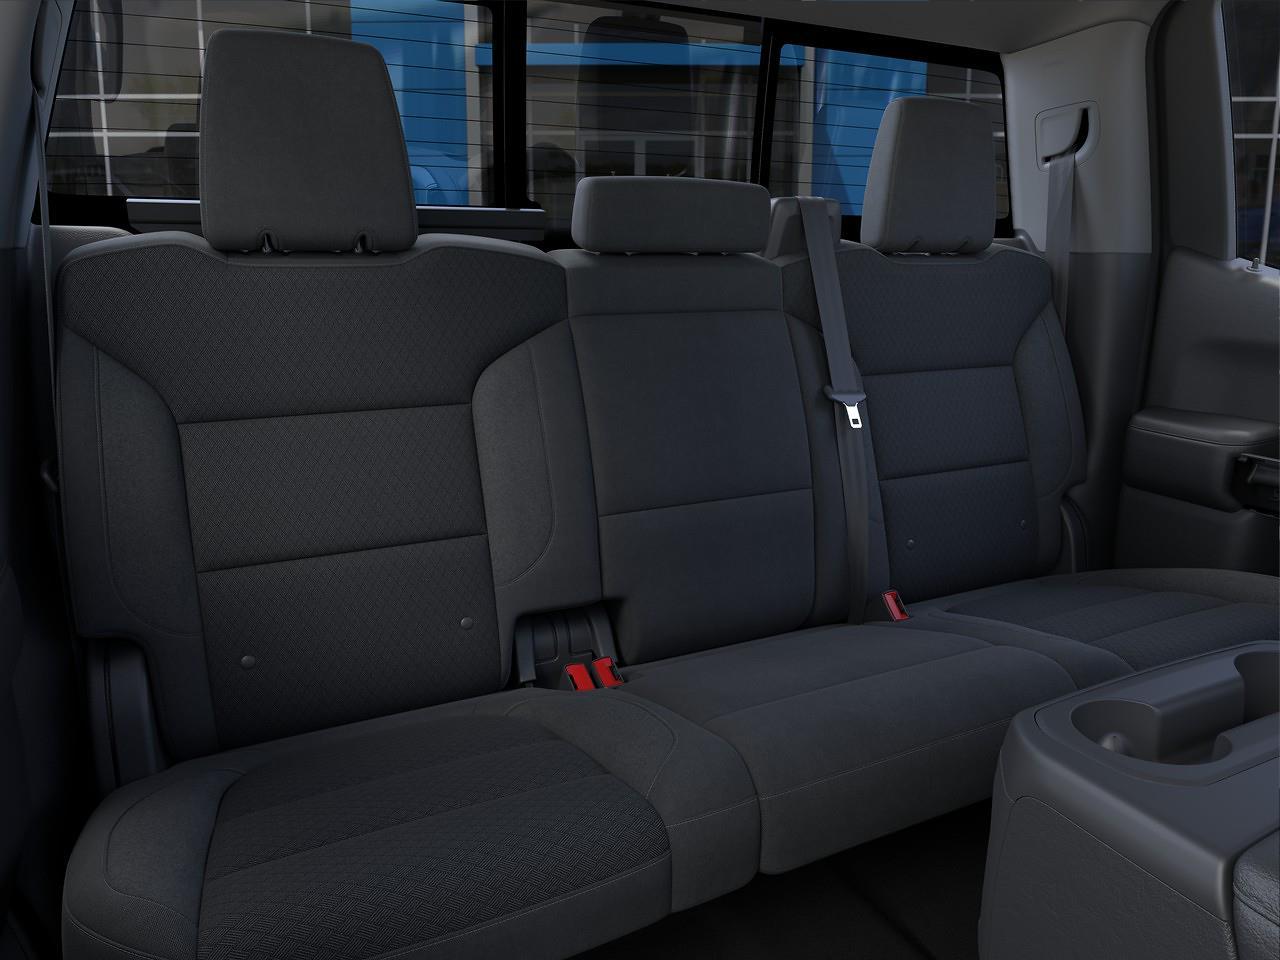 2021 Chevrolet Silverado 1500 Double Cab 4x4, Pickup #Q210048 - photo 34